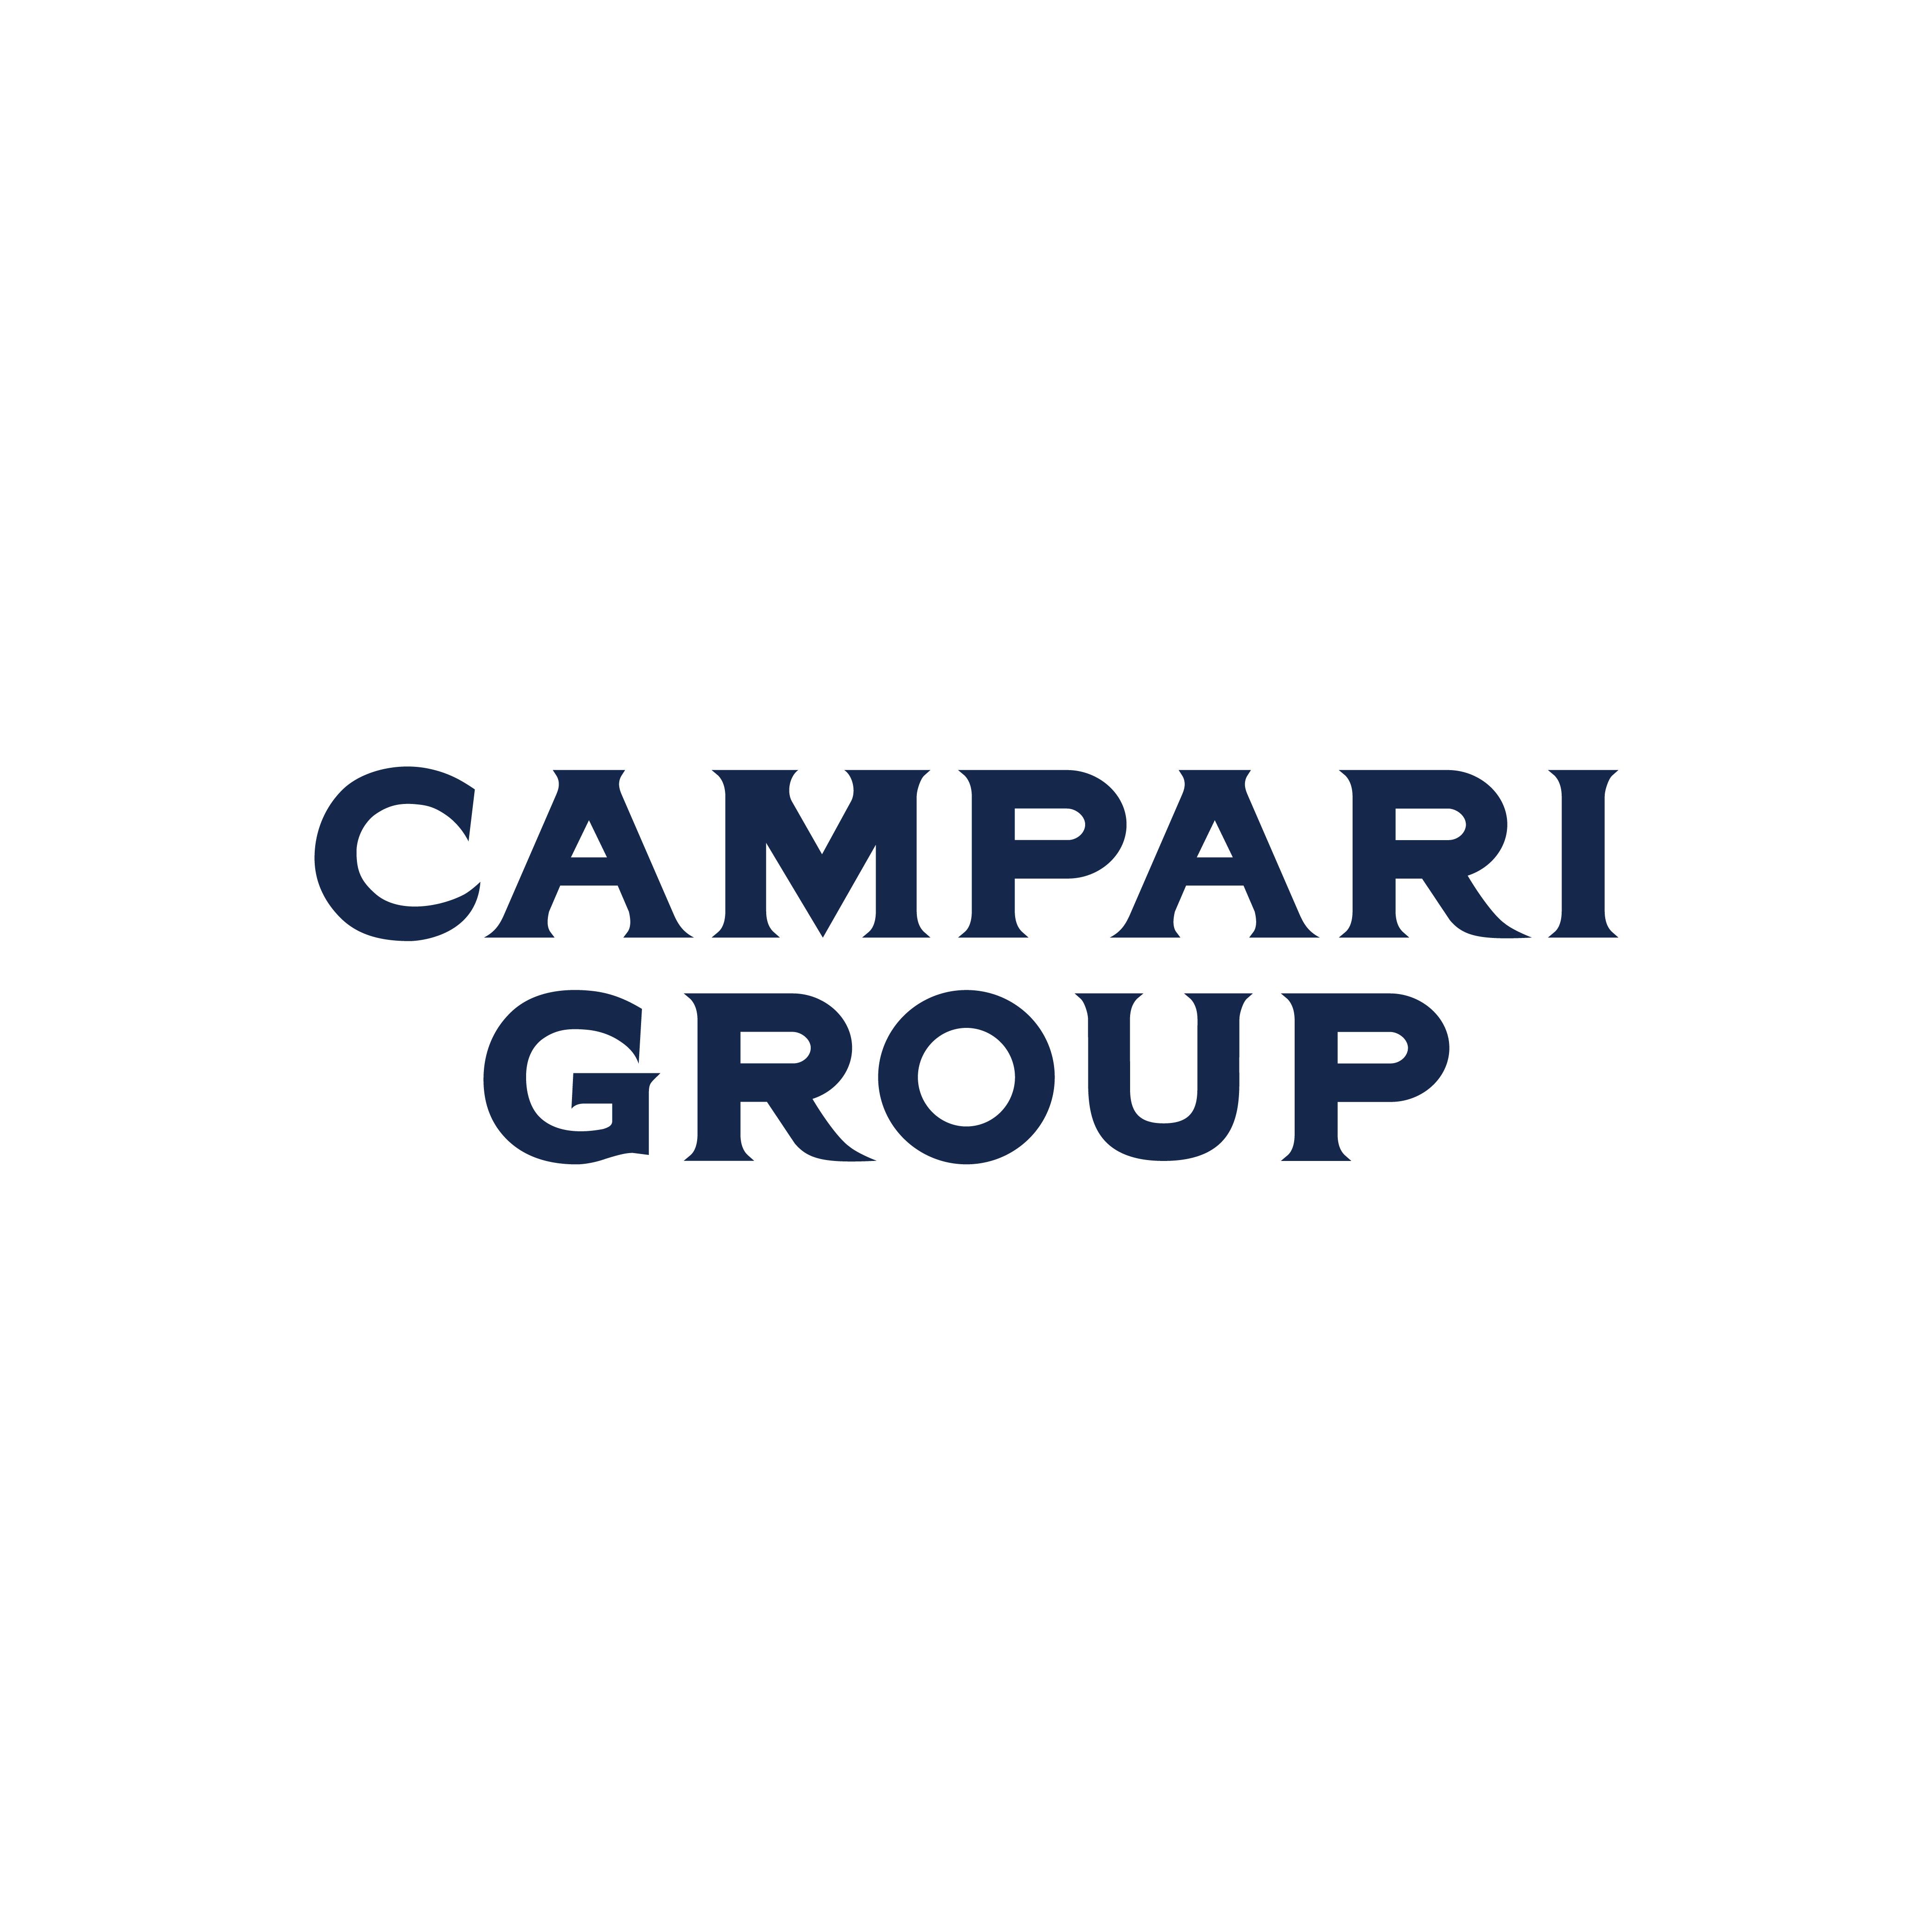 Campari Group_On White